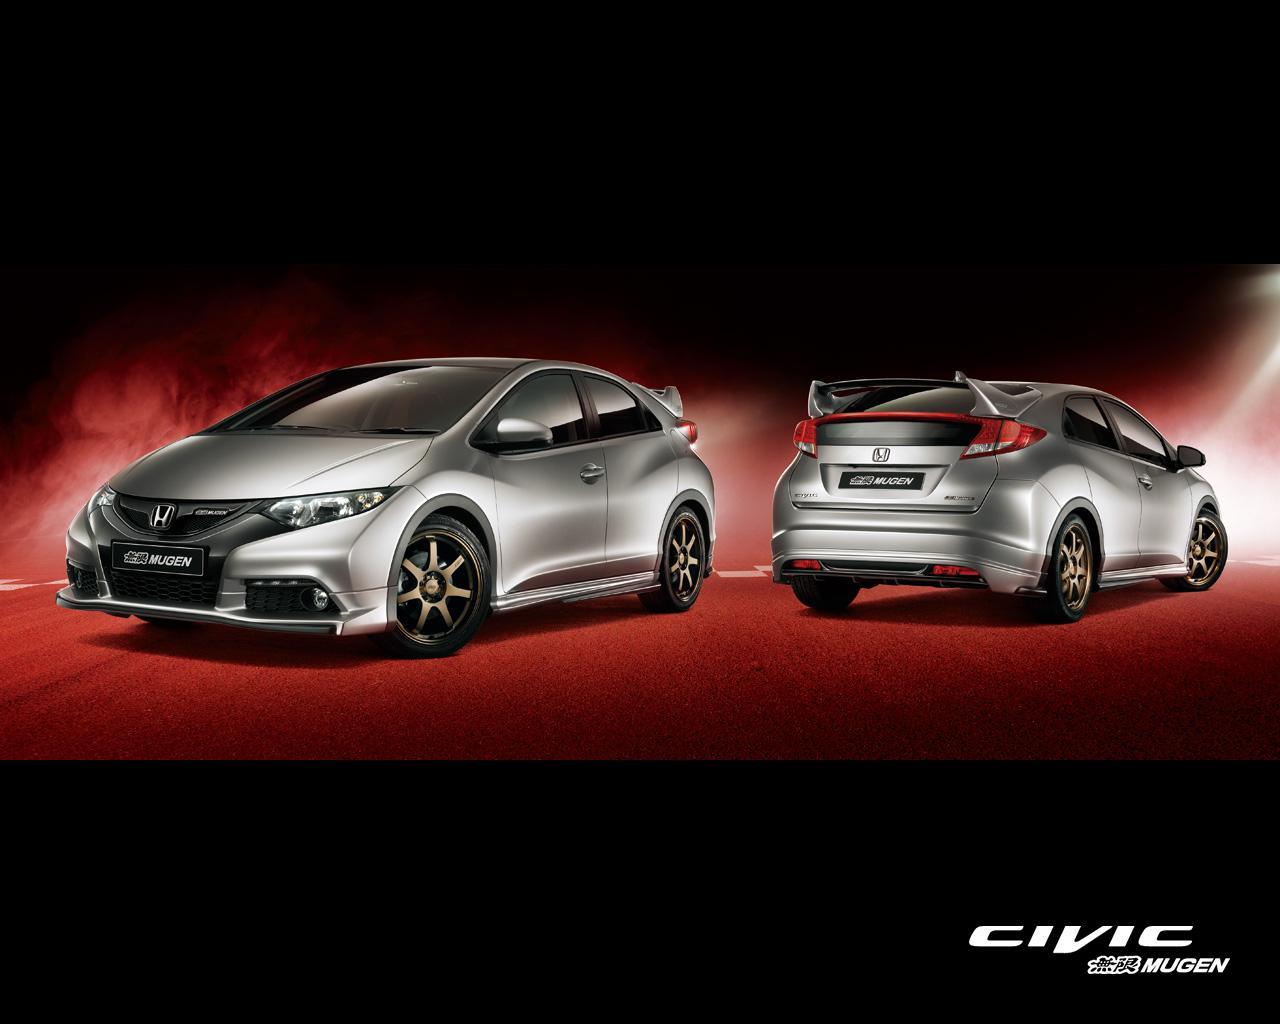 Honda Civic Colors >> Honda Civic Hatchback Gets Mugen Styling Pack - autoevolution